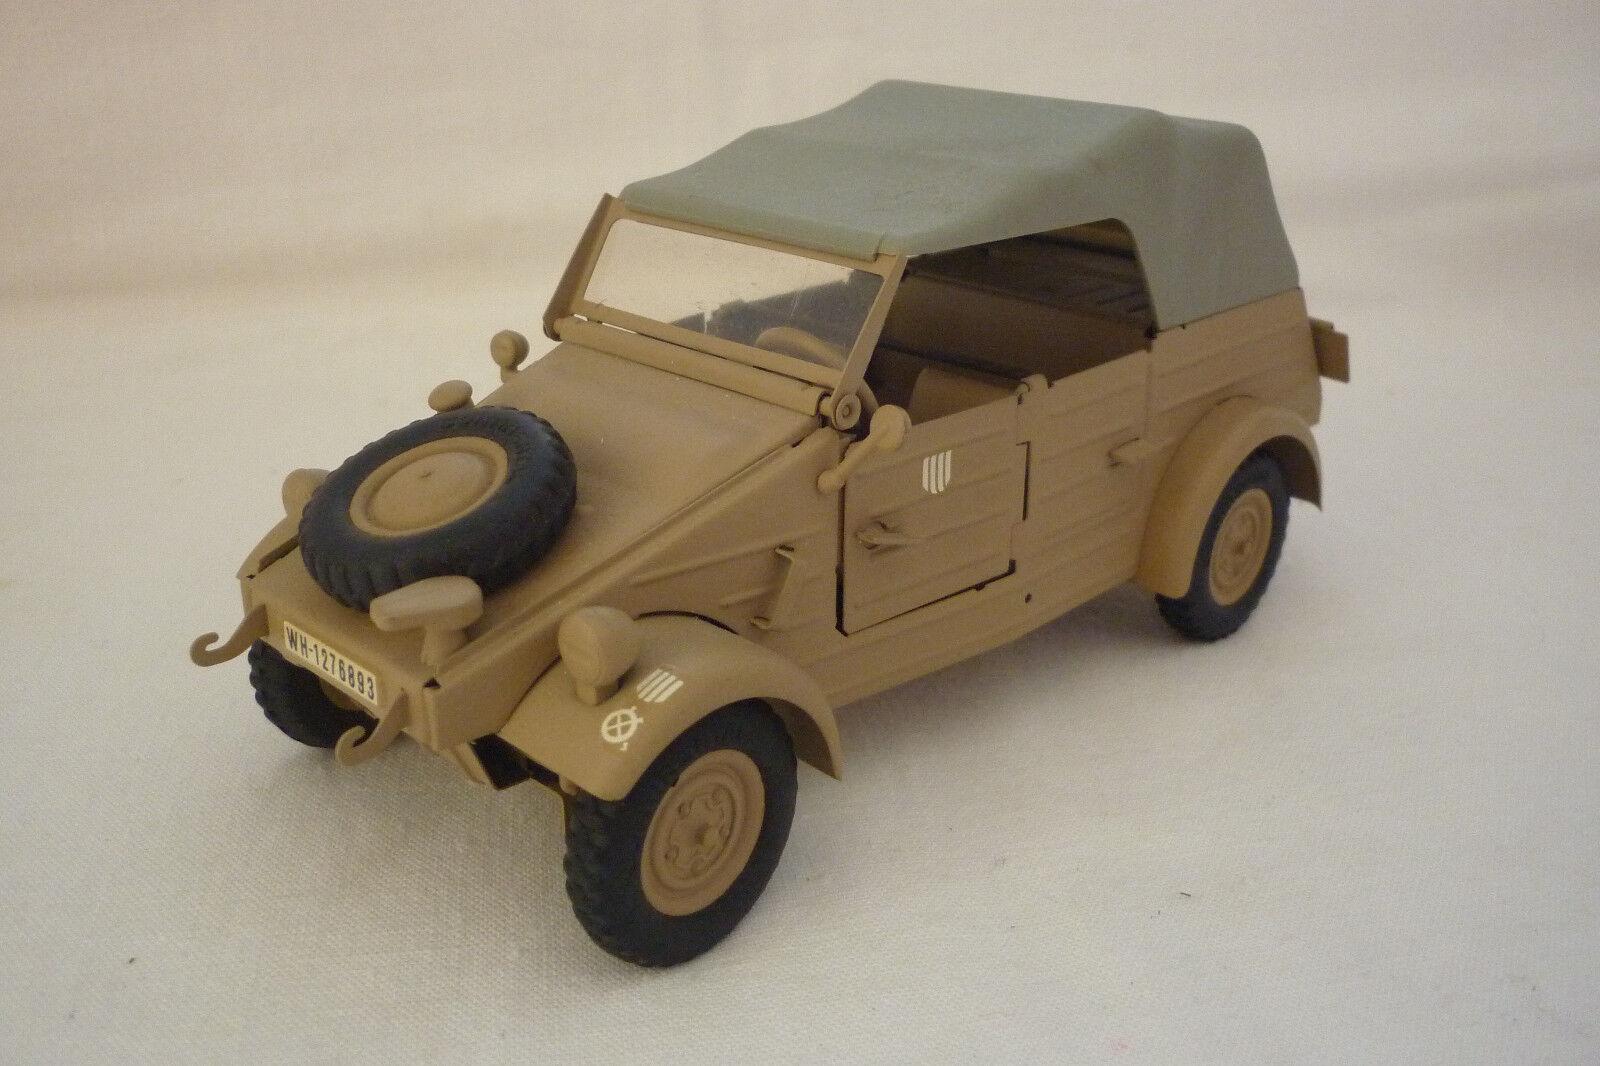 VOLKSWAGEN-VW tipo 82 Carrello portavasi portavasi portavasi - 1:24 -  2.div-27  c56b26